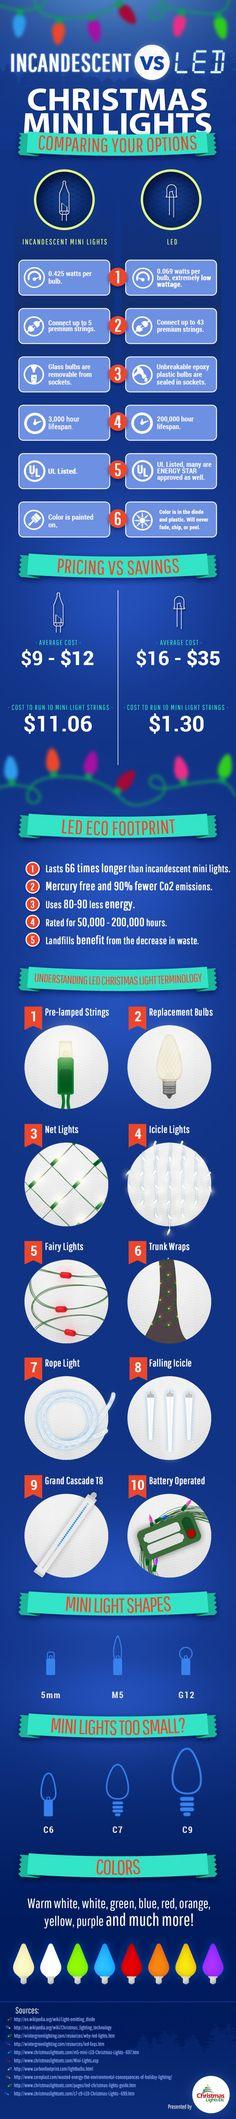 15 best christmas lights etc images on Pinterest Christmas crafts